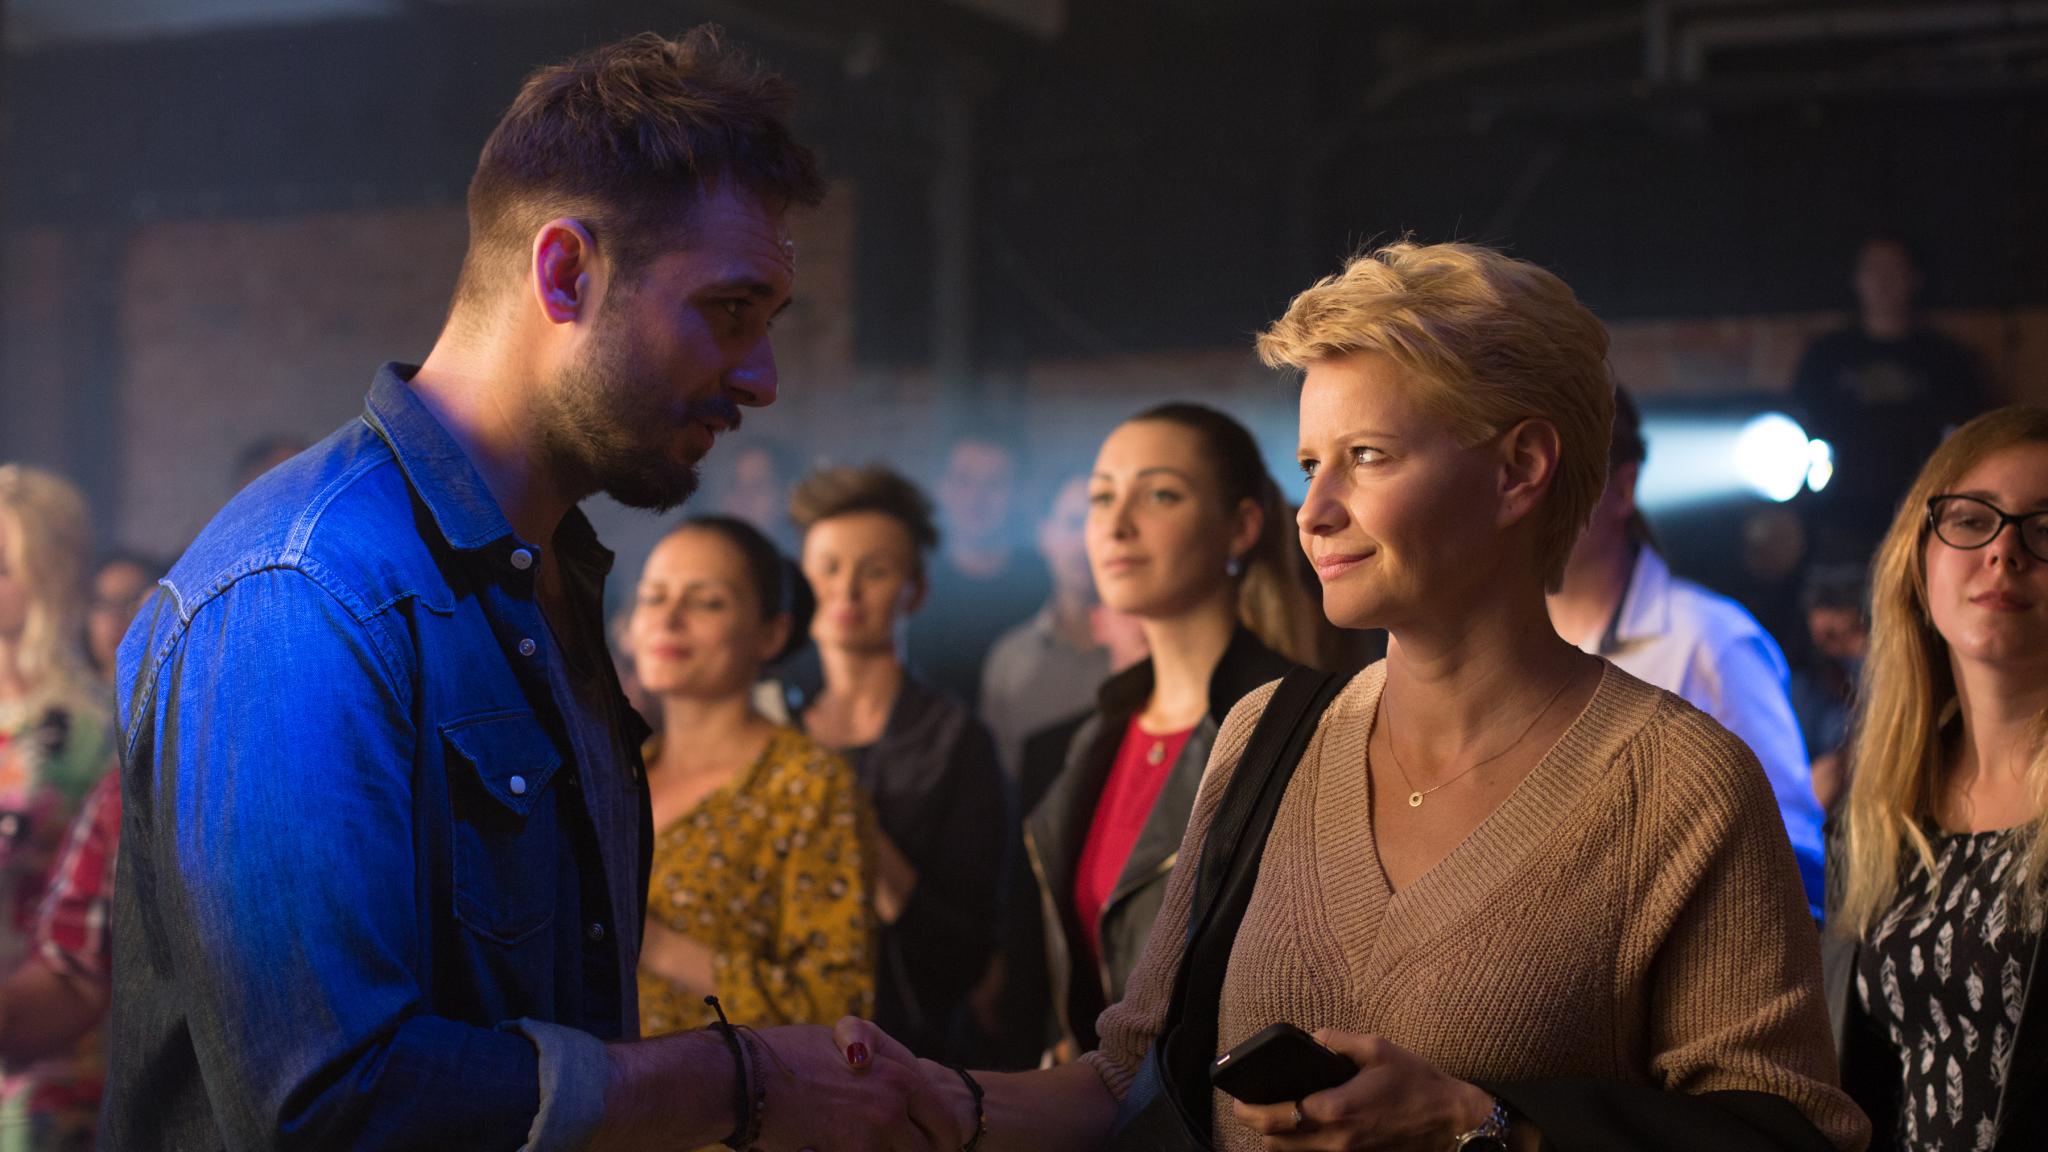 Druga szansa 4 - odcinek 1 - Monika i Piotr